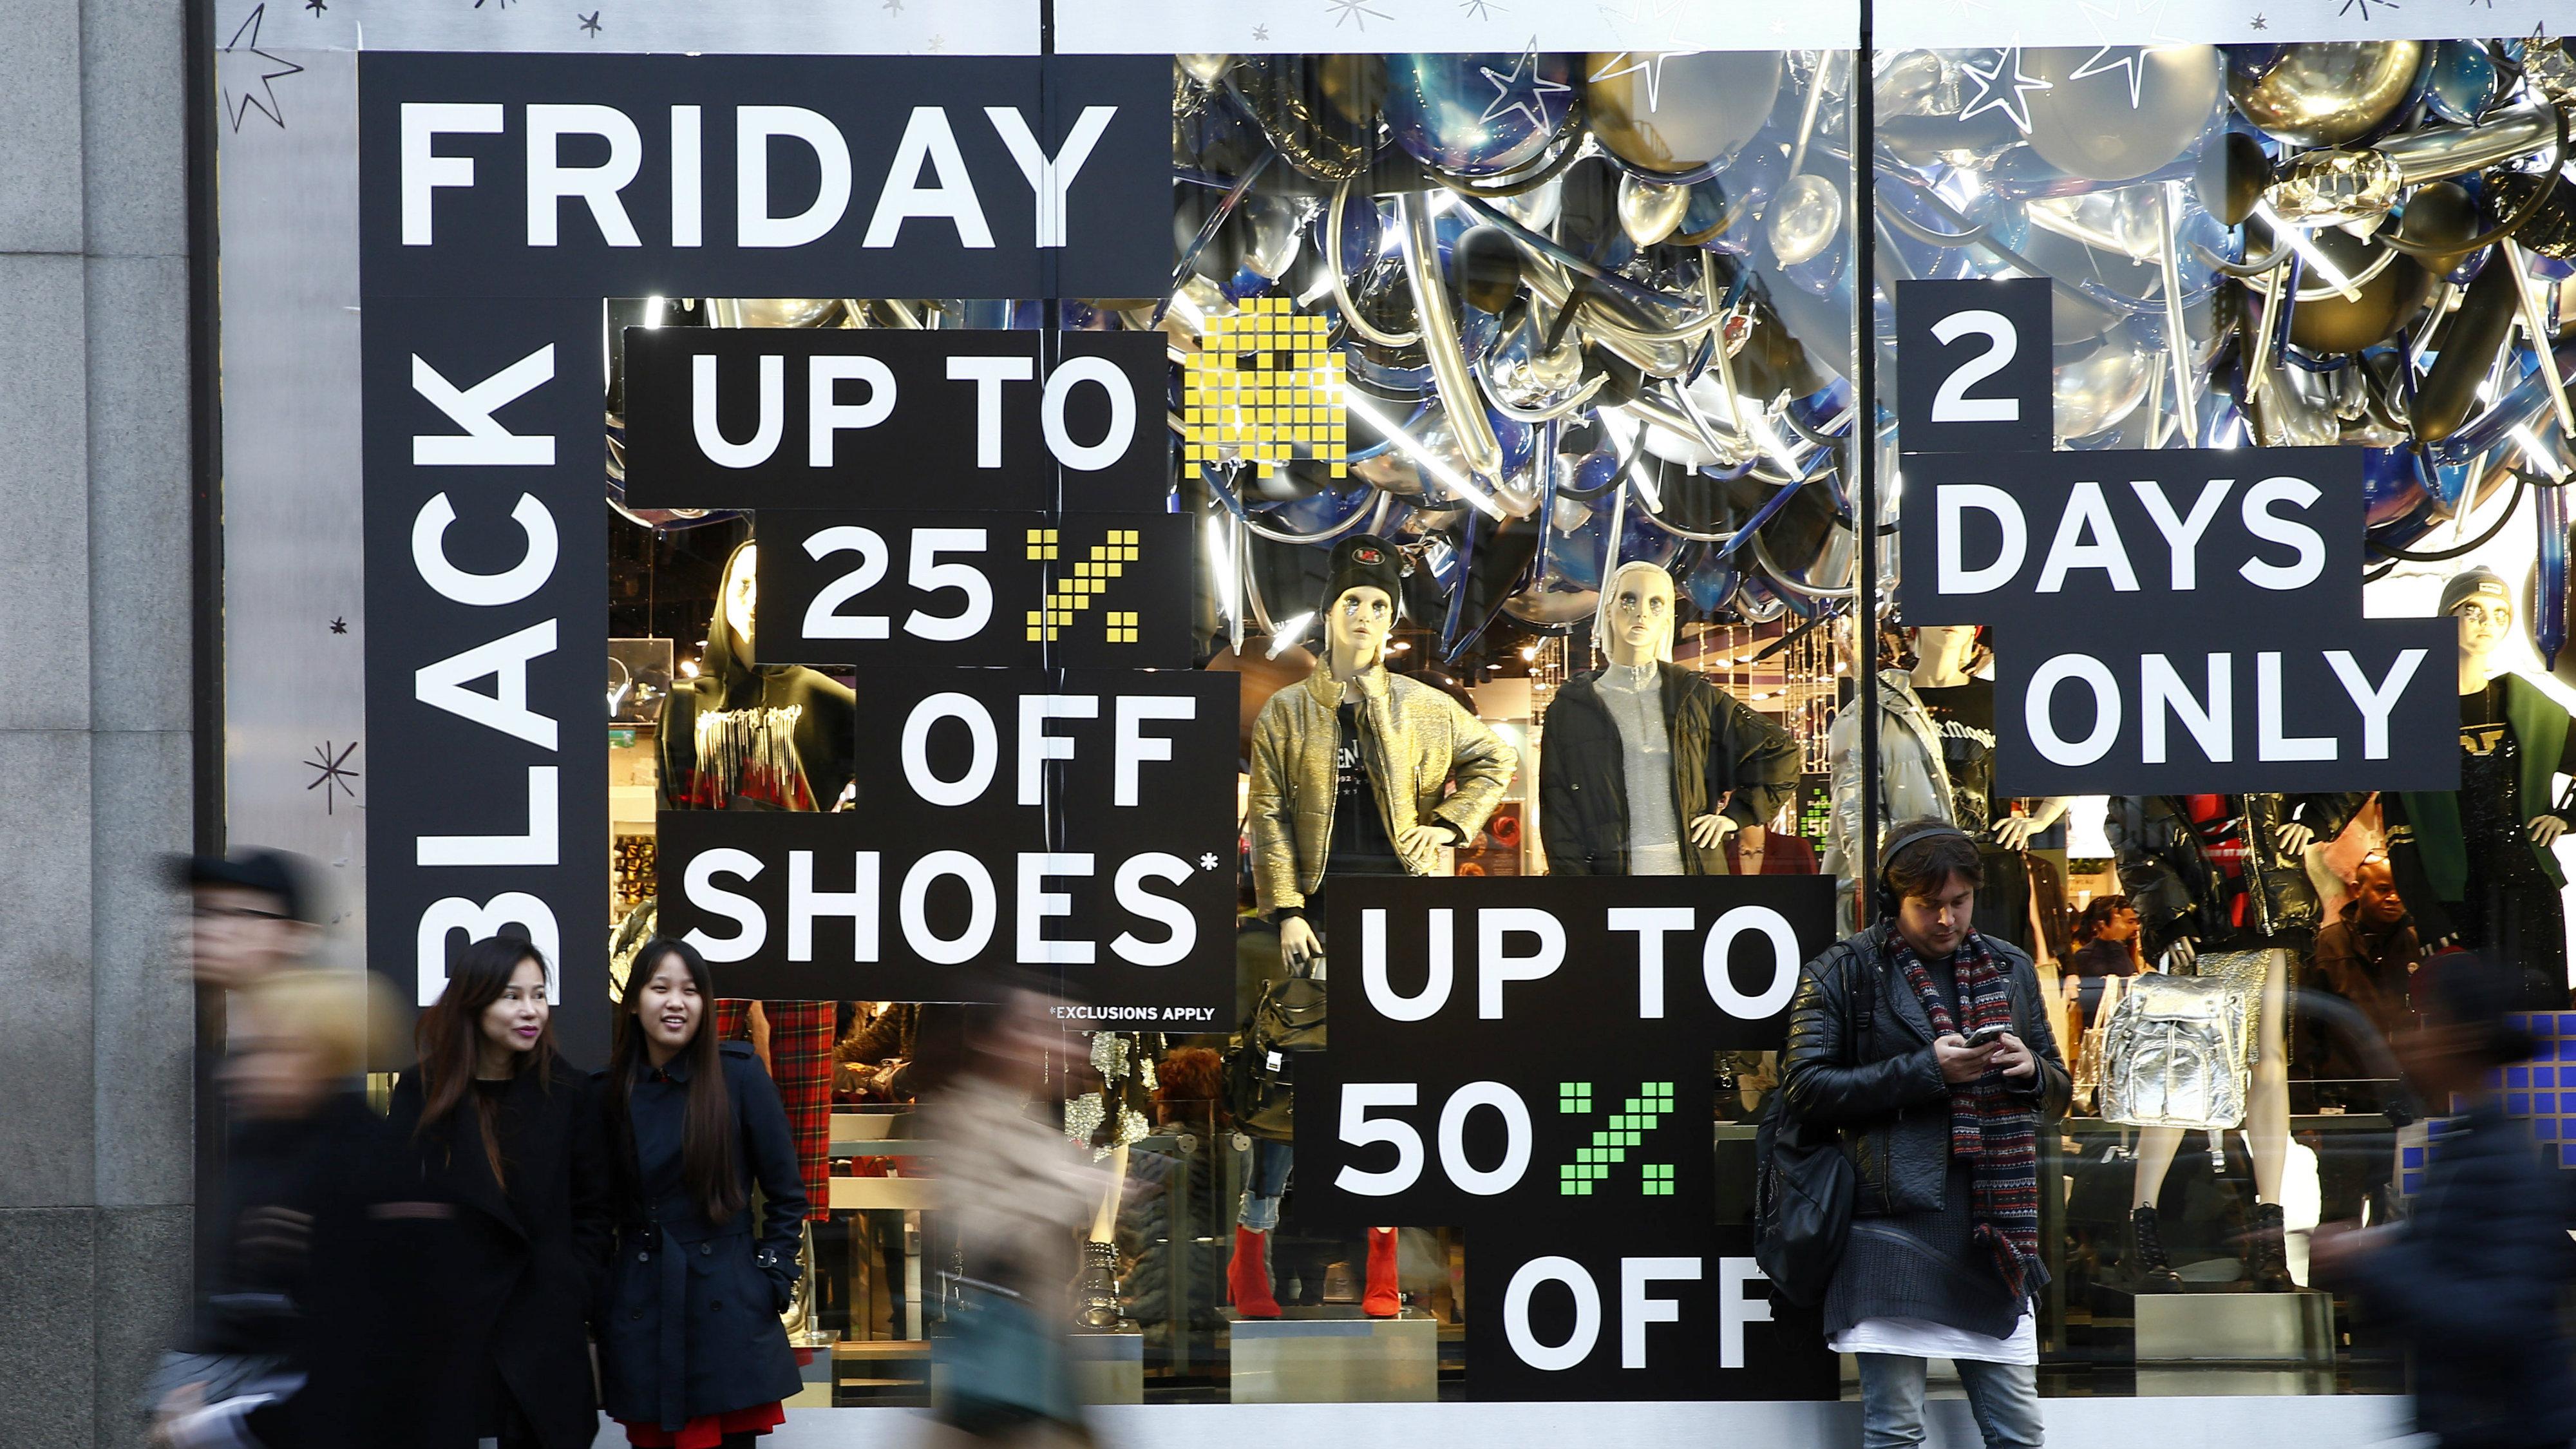 Black Friday sales in shop windows